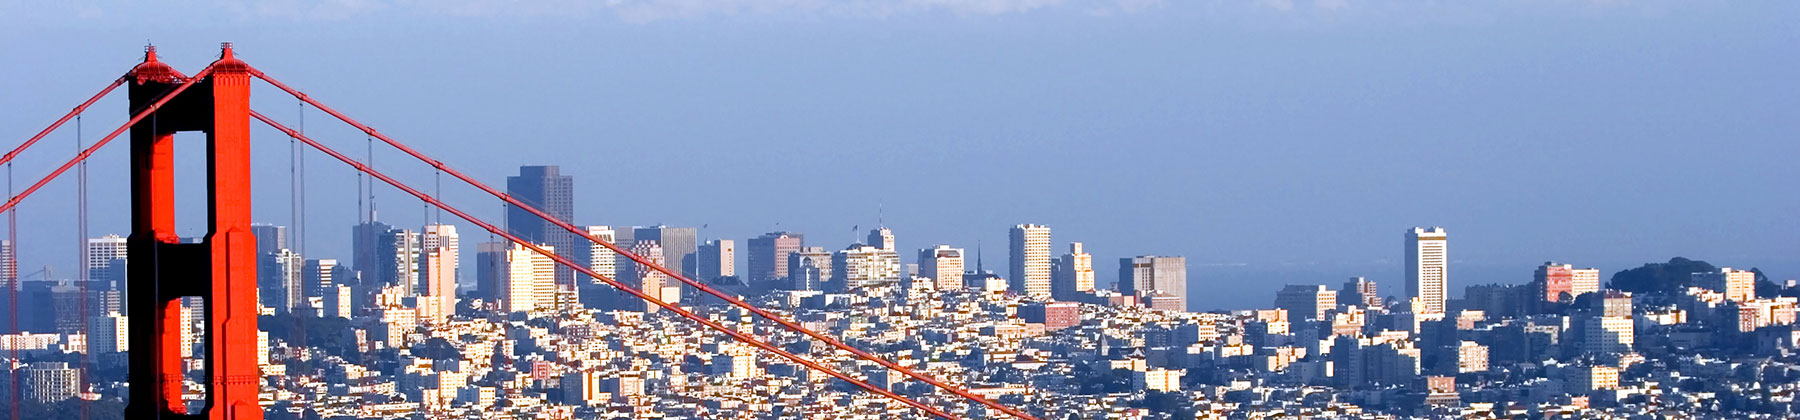 walkin coolers and freezers in San Francisco California